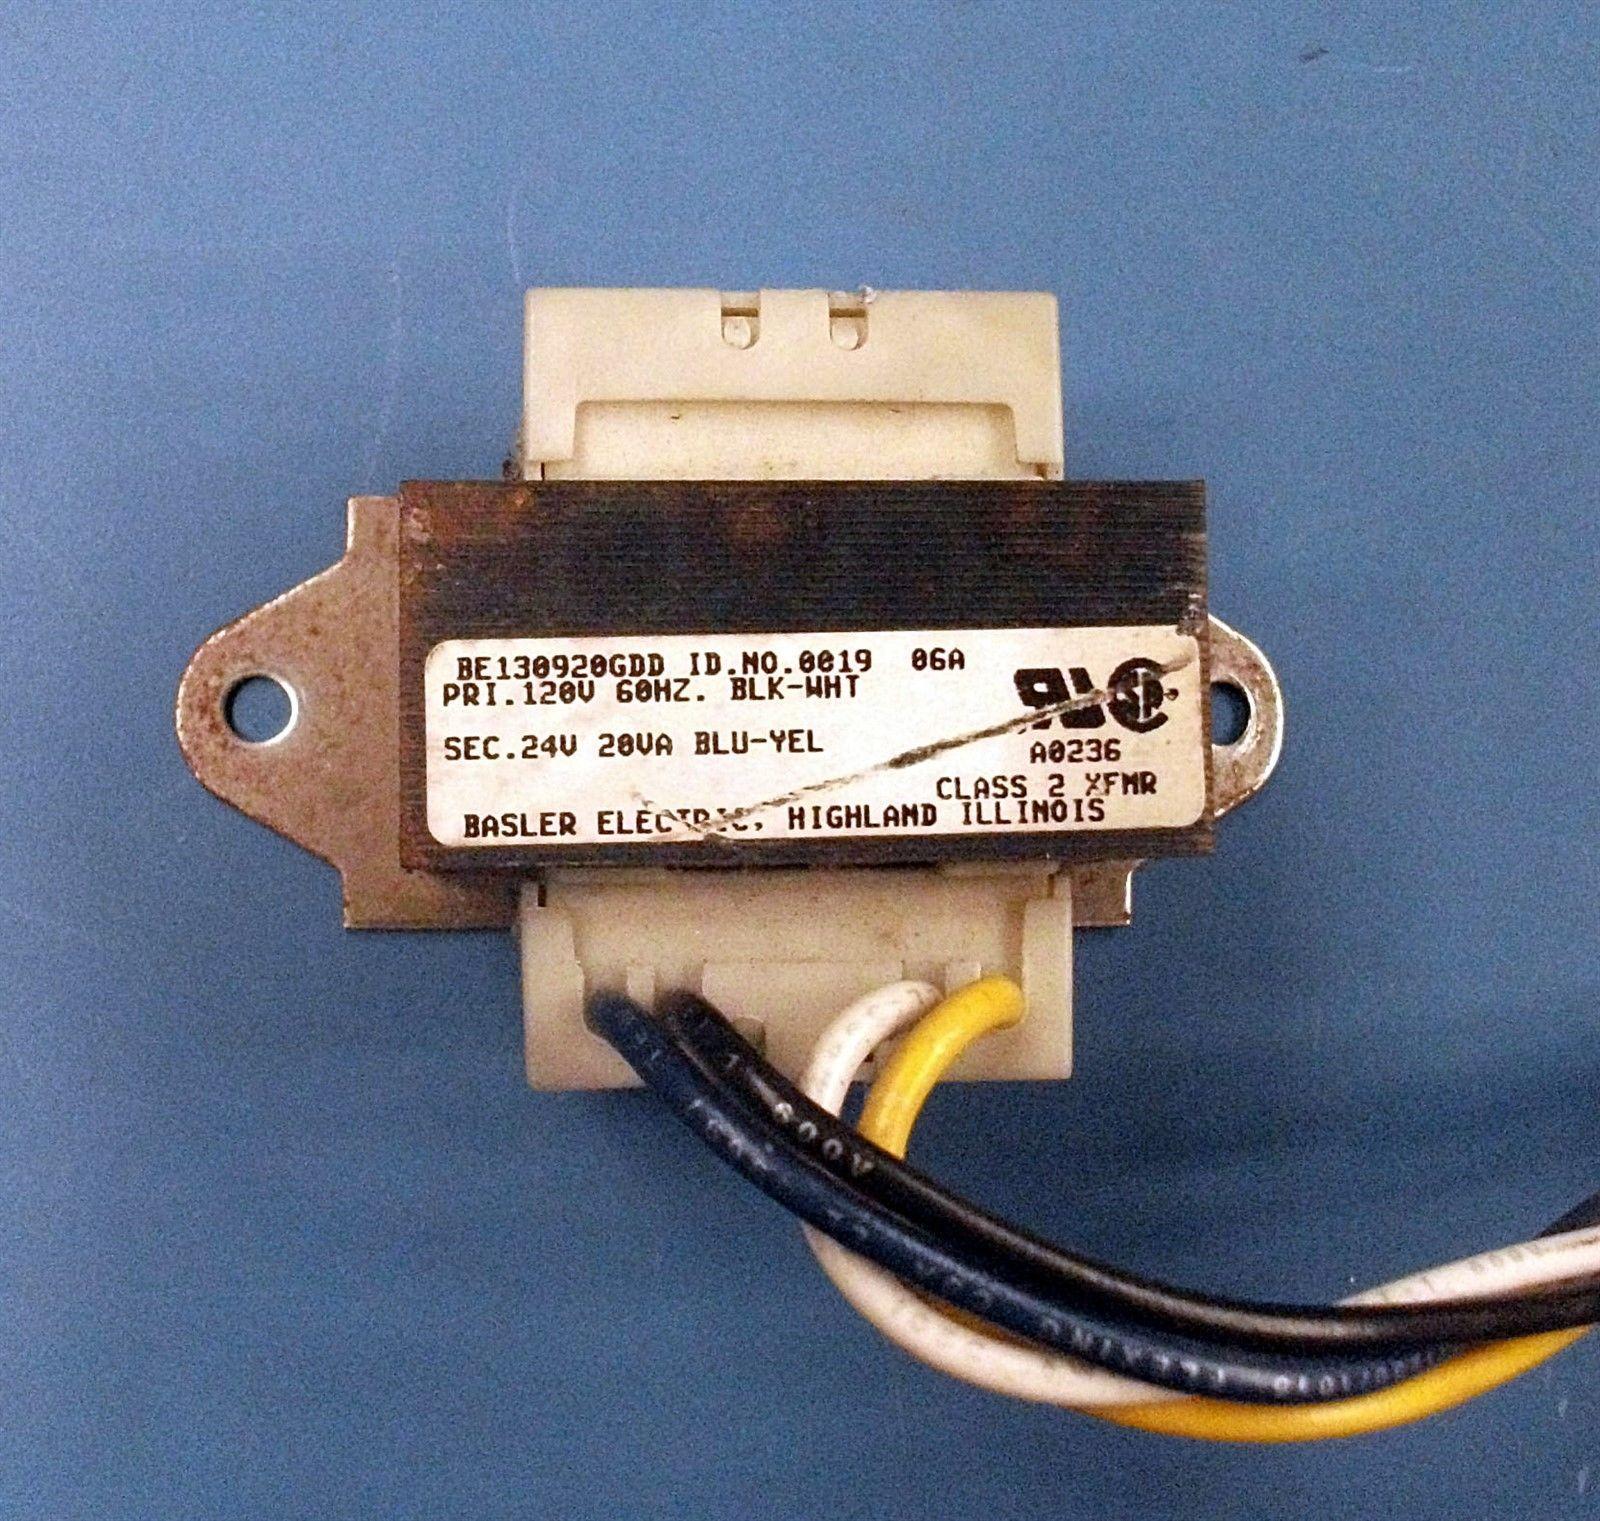 Class 2 Transformer 120v 60hz BE130920GDD